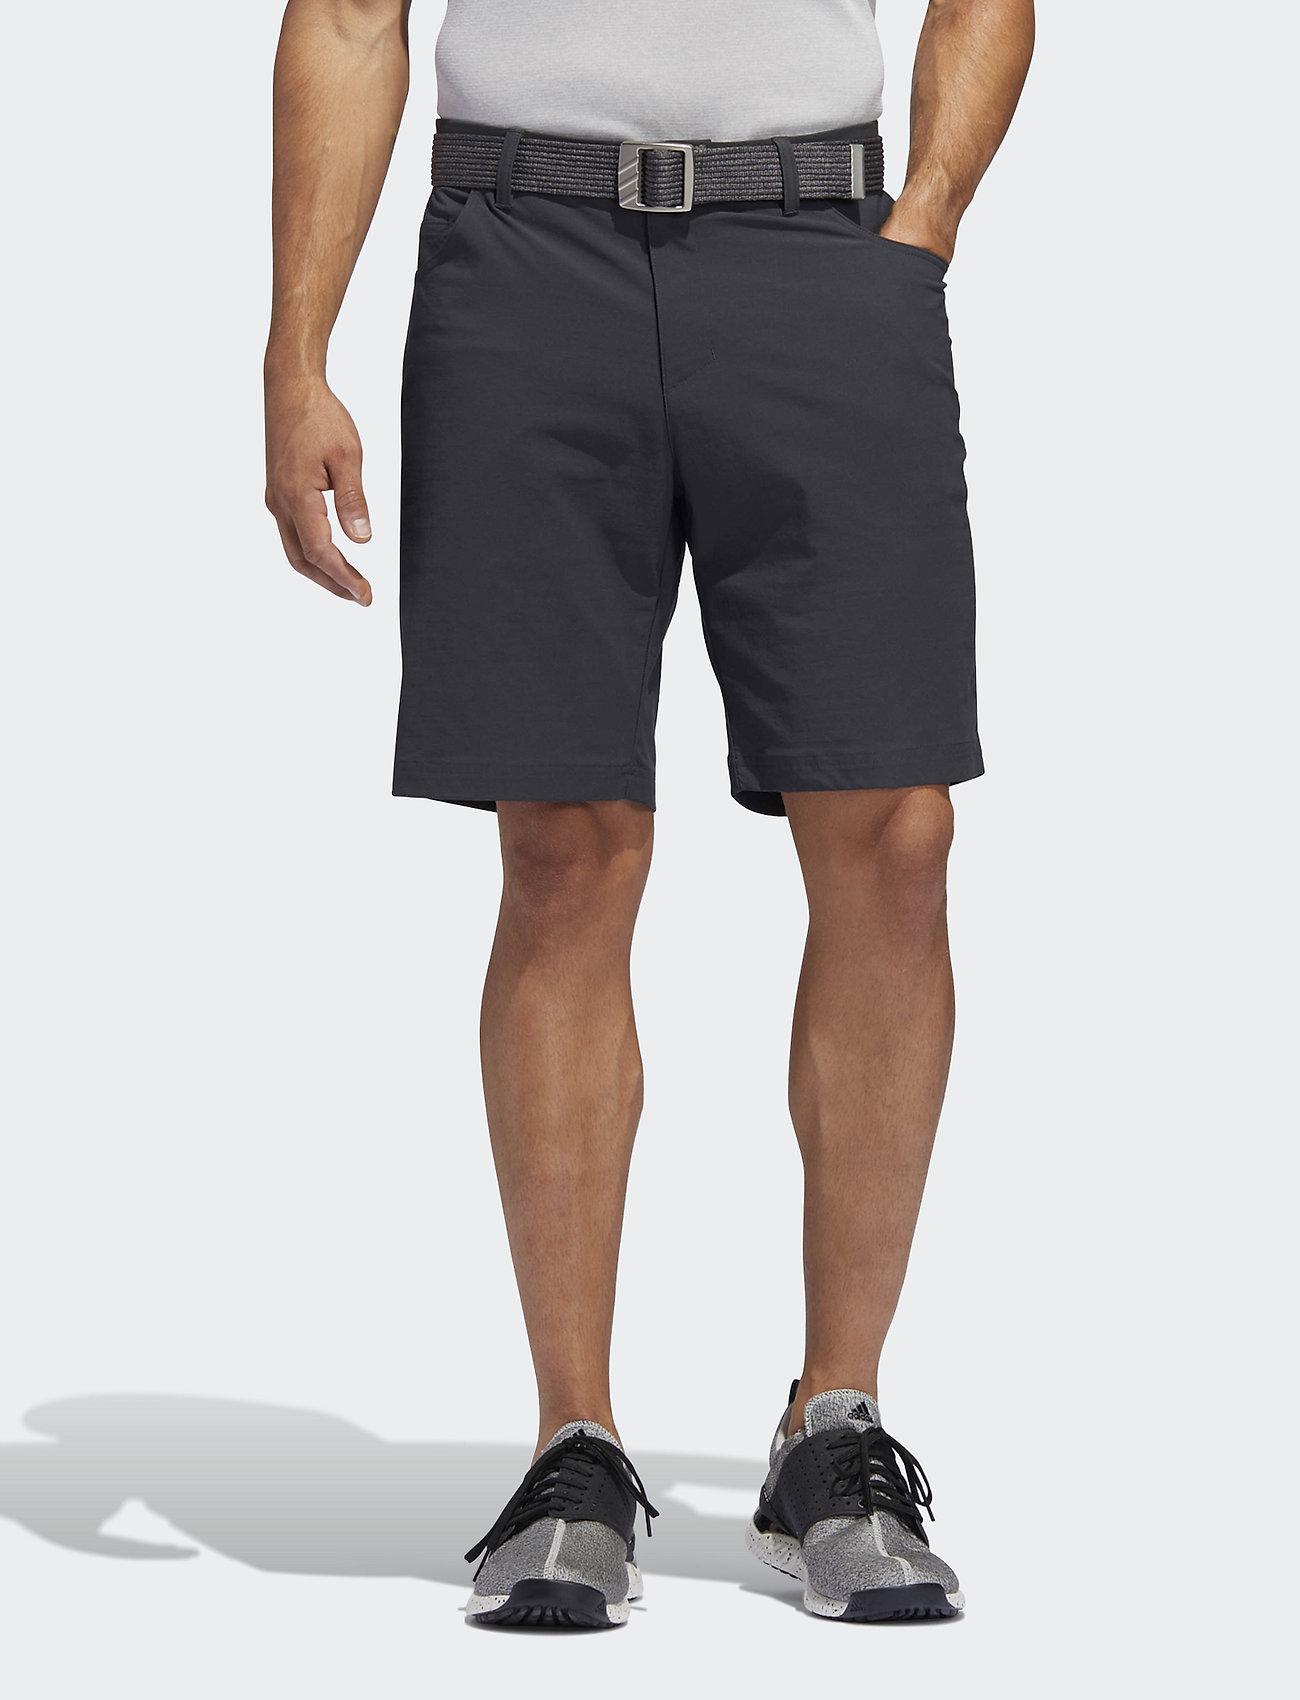 adidas Golf - ADIX 5PKT SHORT - szorty golfowe - carbon - 0